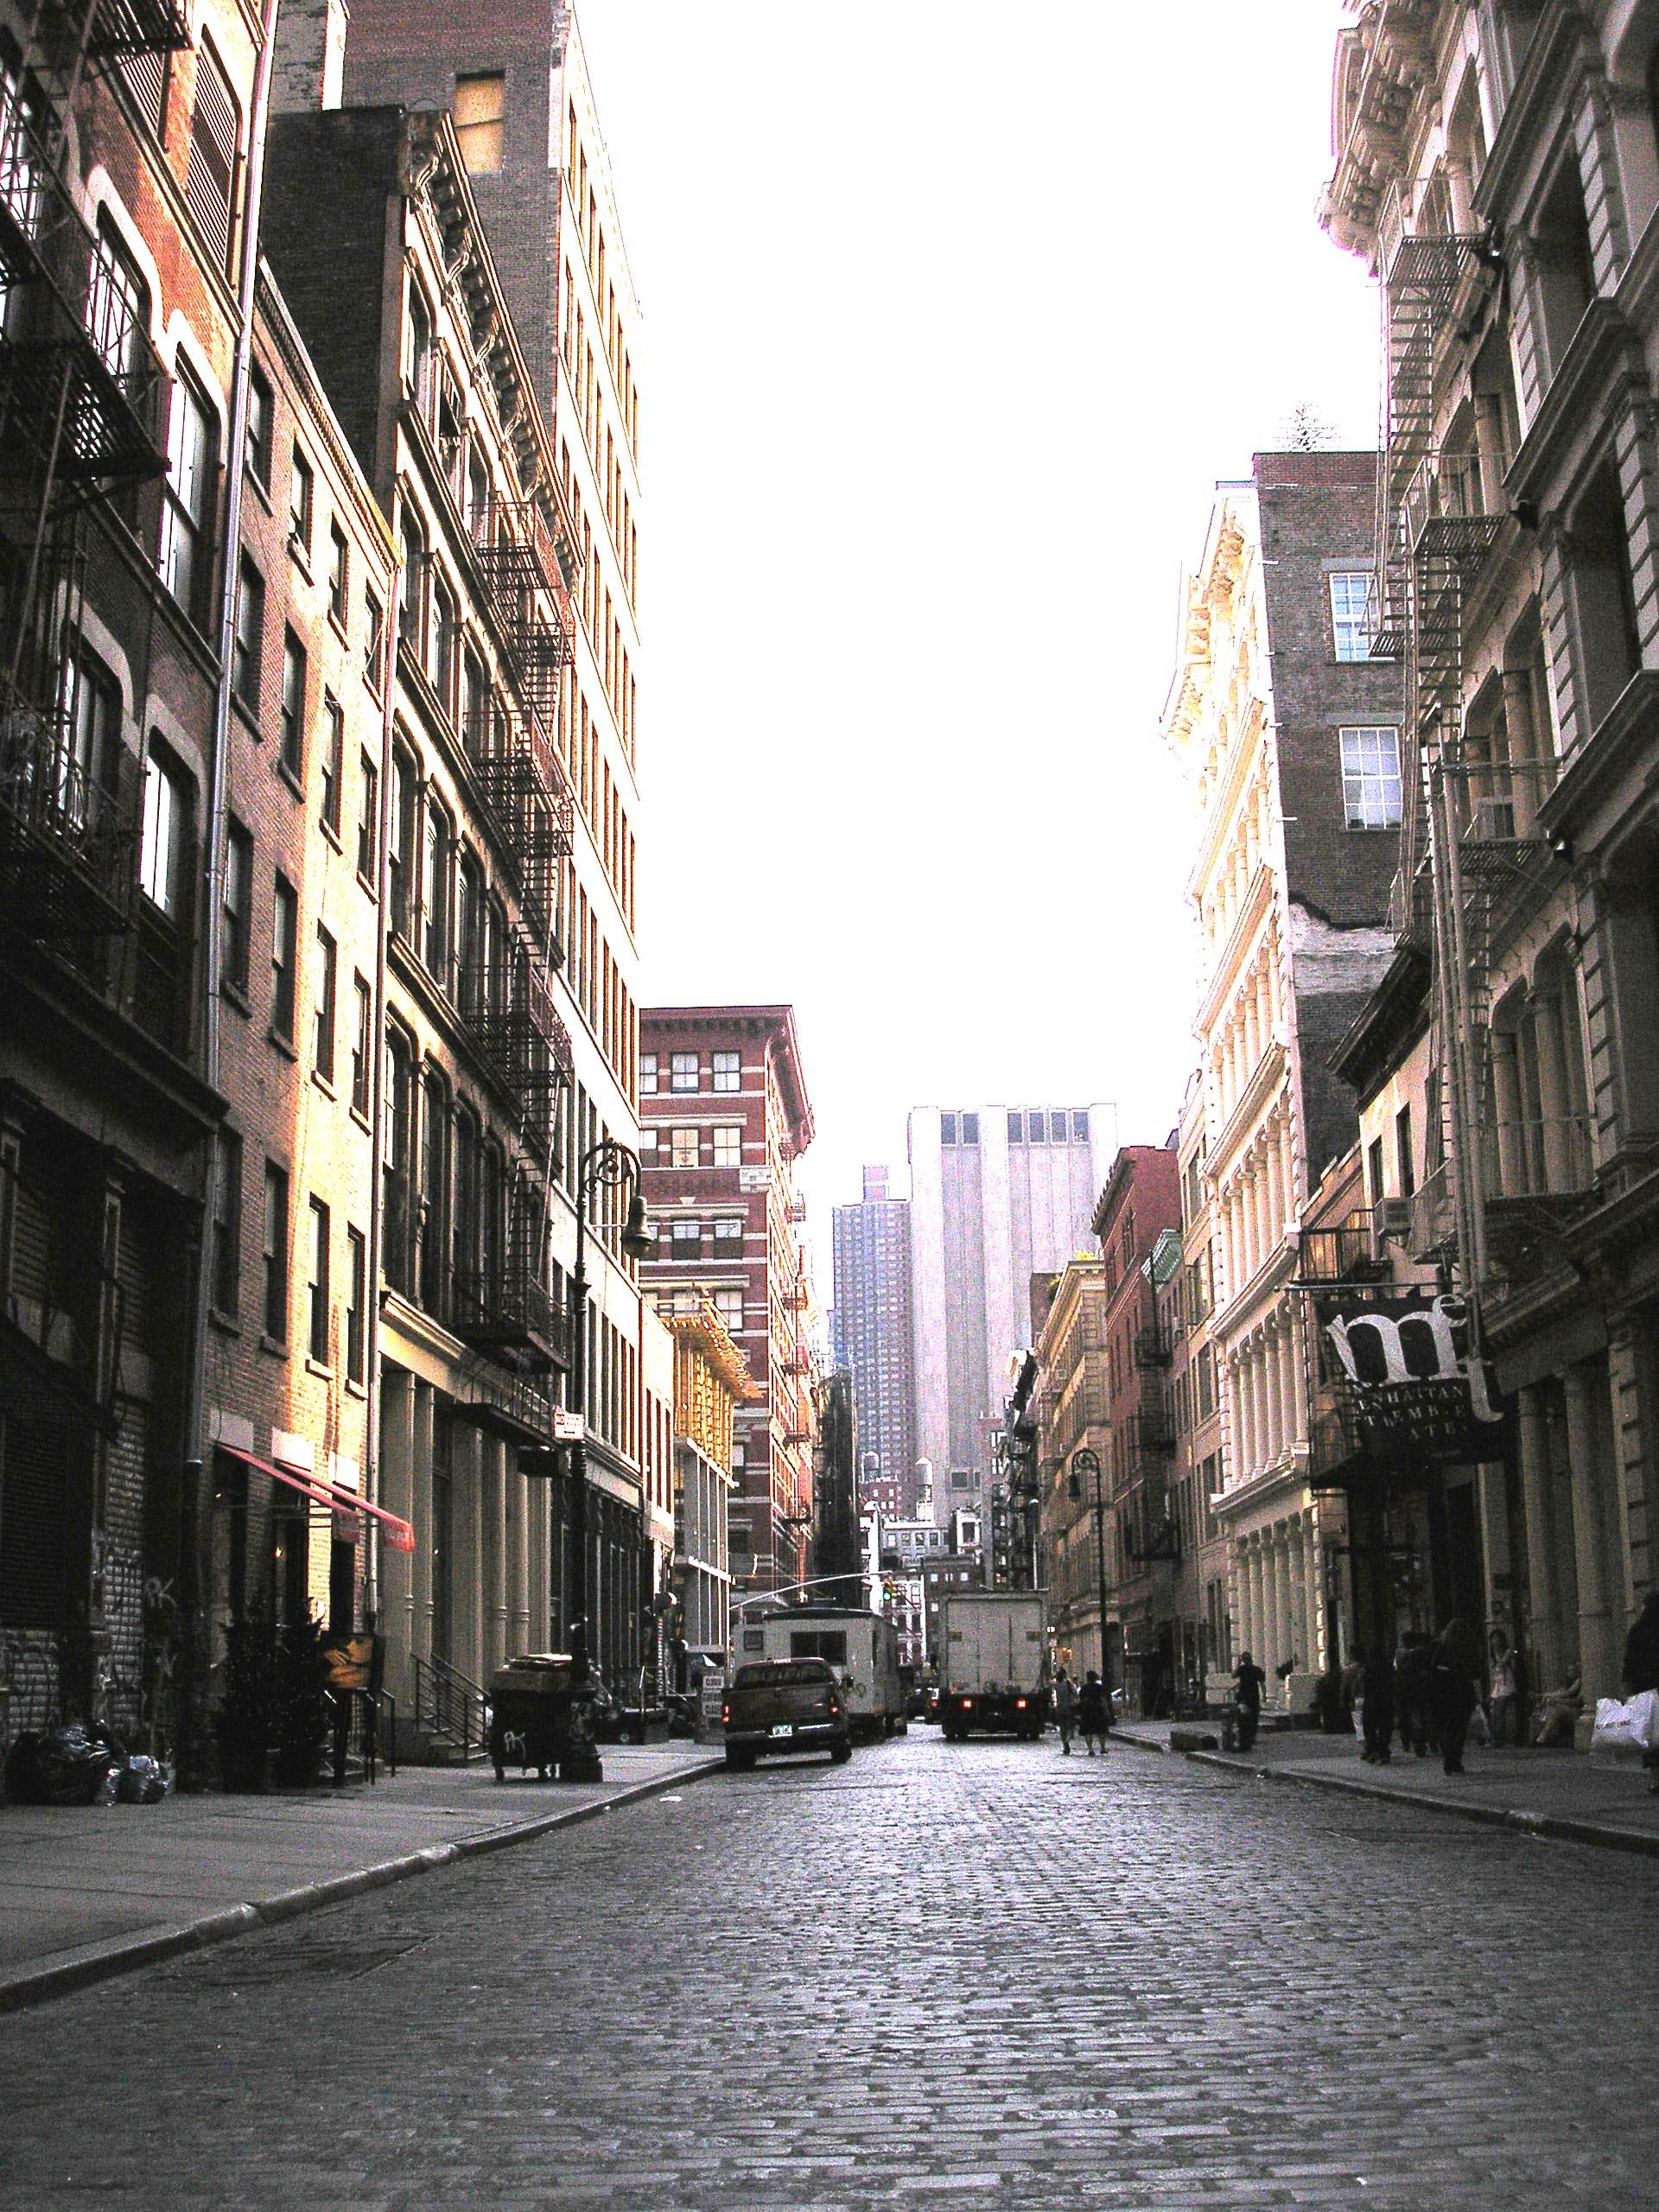 streets of new york 3 1542541 - OLYMPUS DIGITAL CAMERA